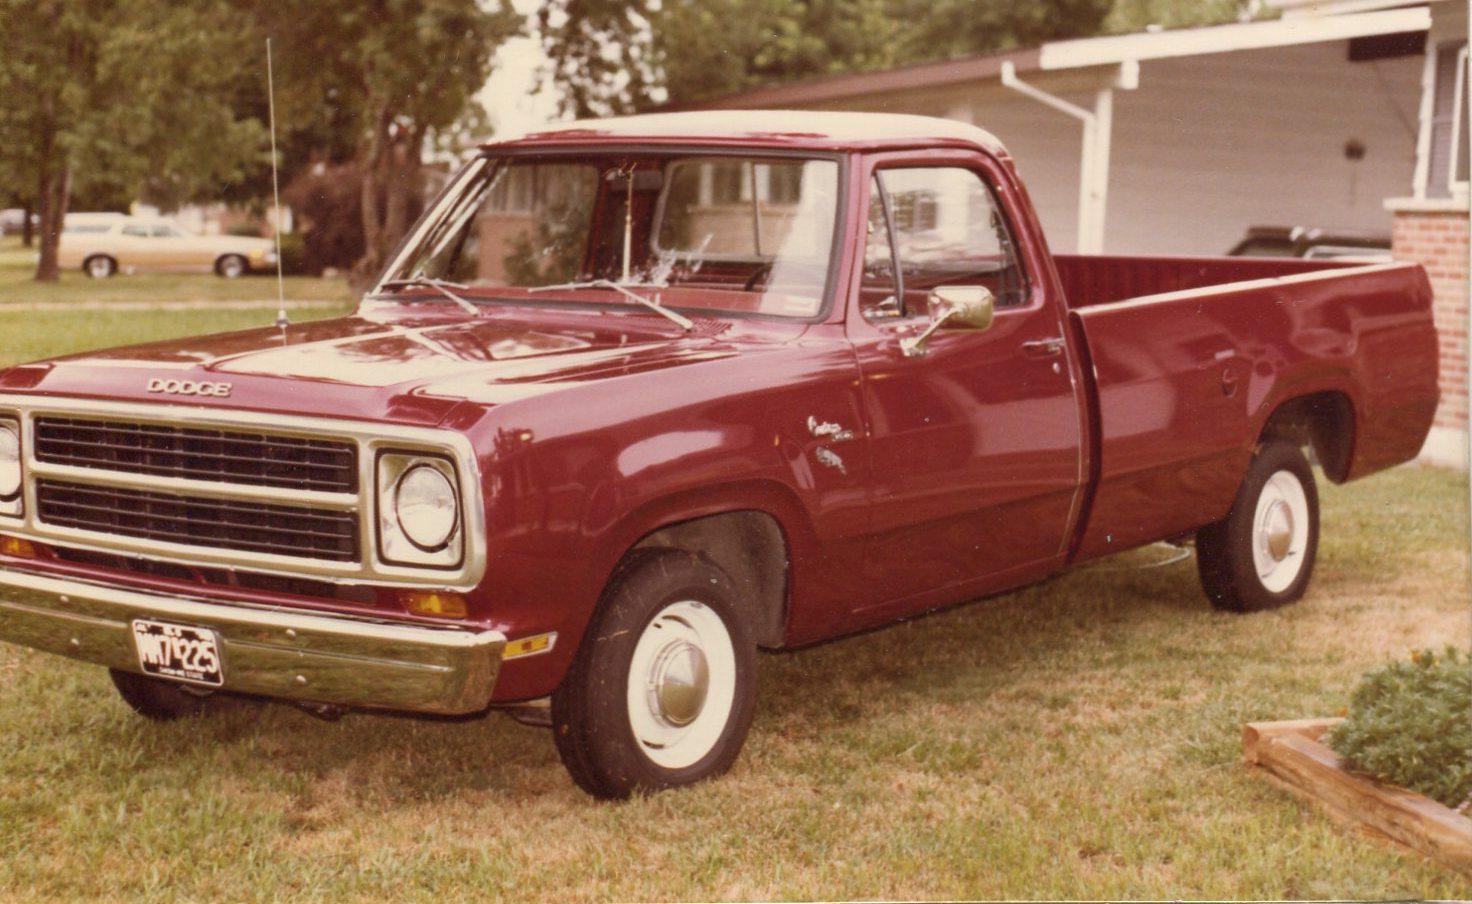 CC Capsule: 1980 Dodge D-series Adventurer – The Essence of a Truck